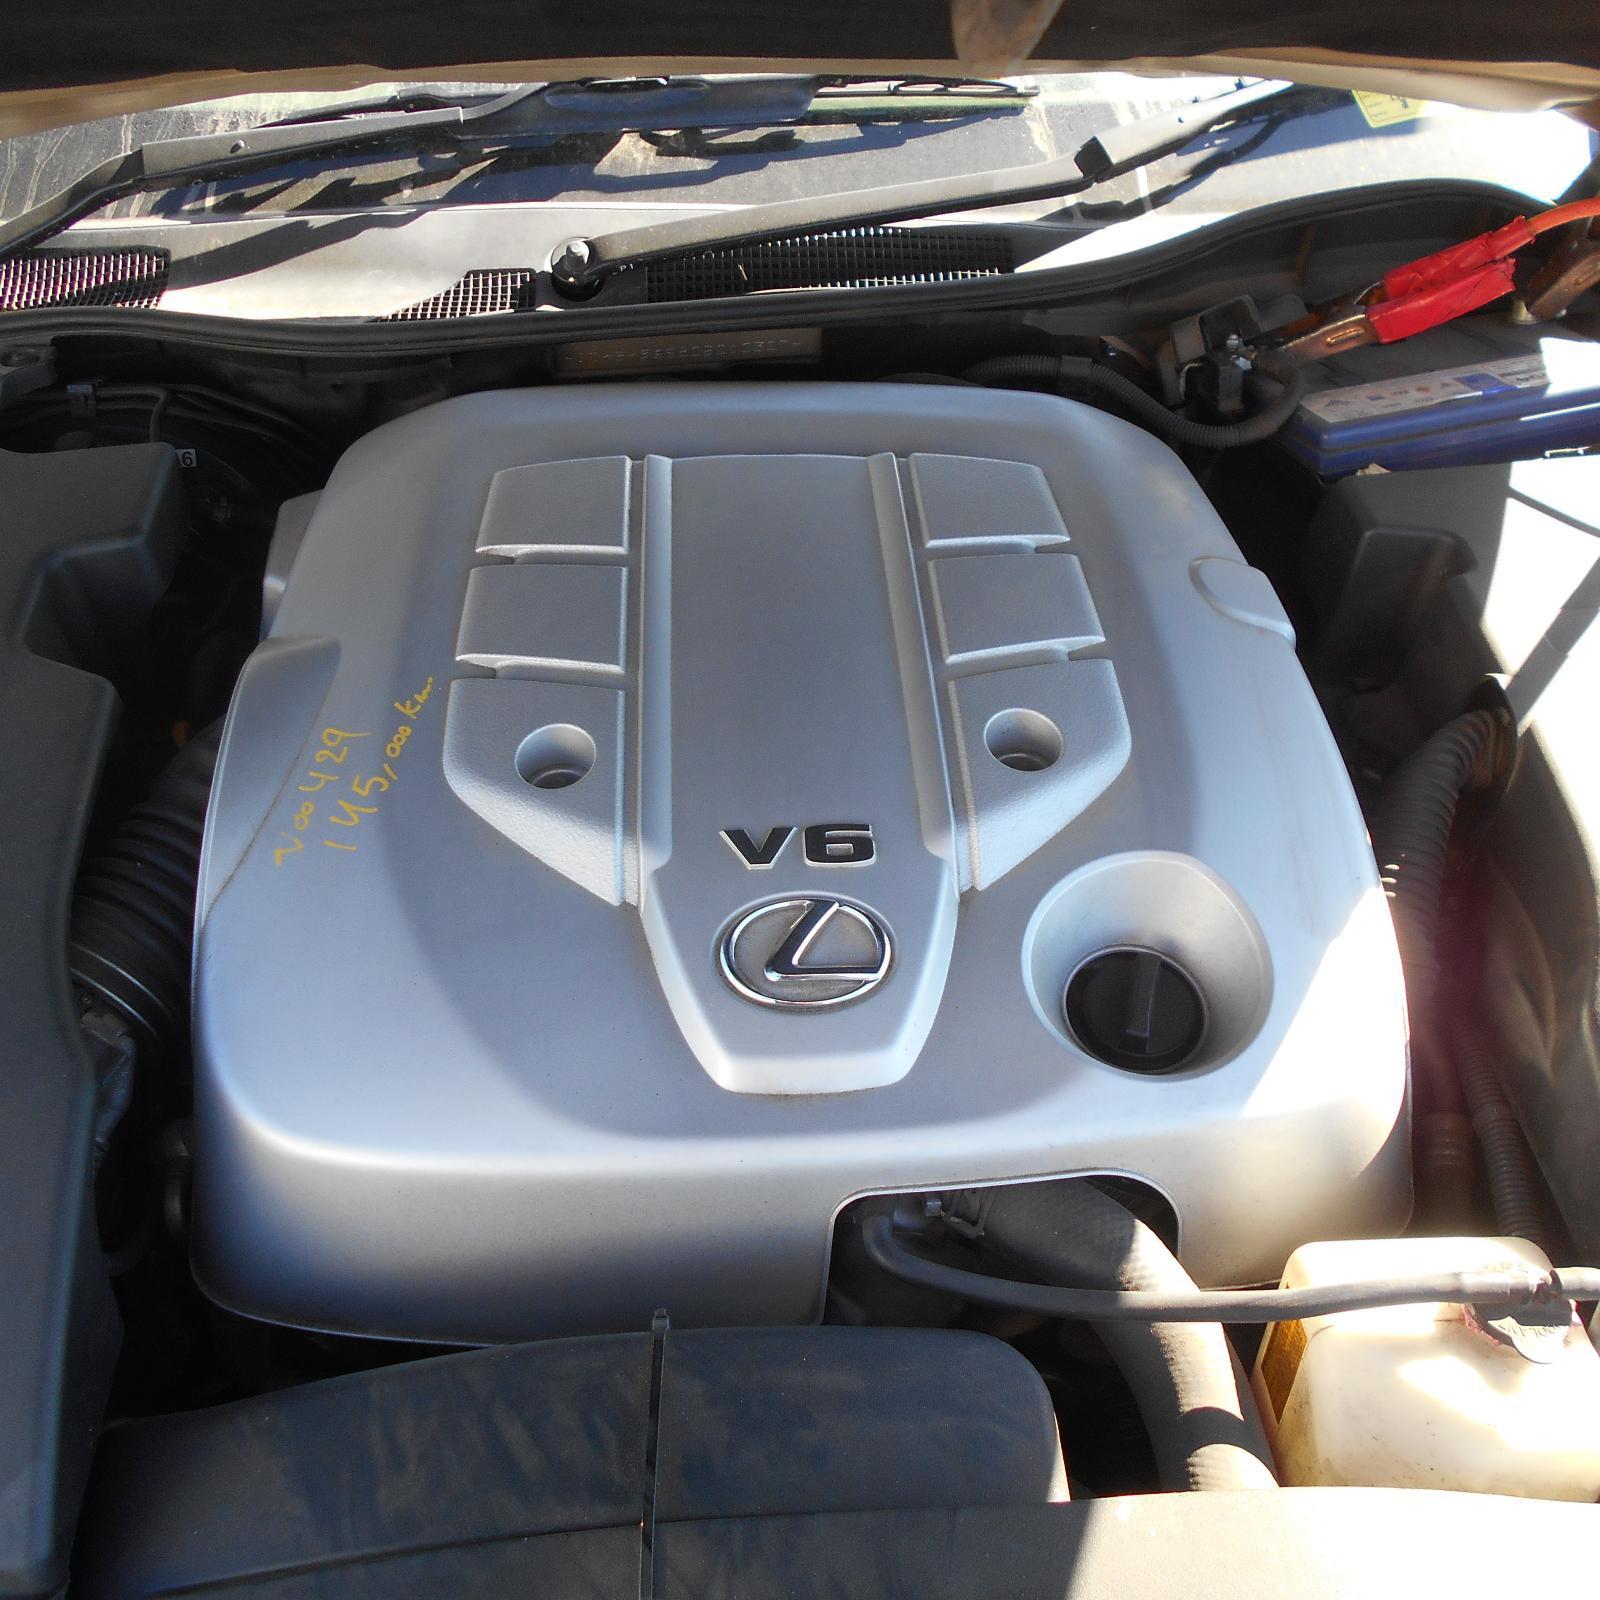 LEXUS GS, Engine, PETROL, 3.0, 3GR, 190 SERIES, 03/05-12/11